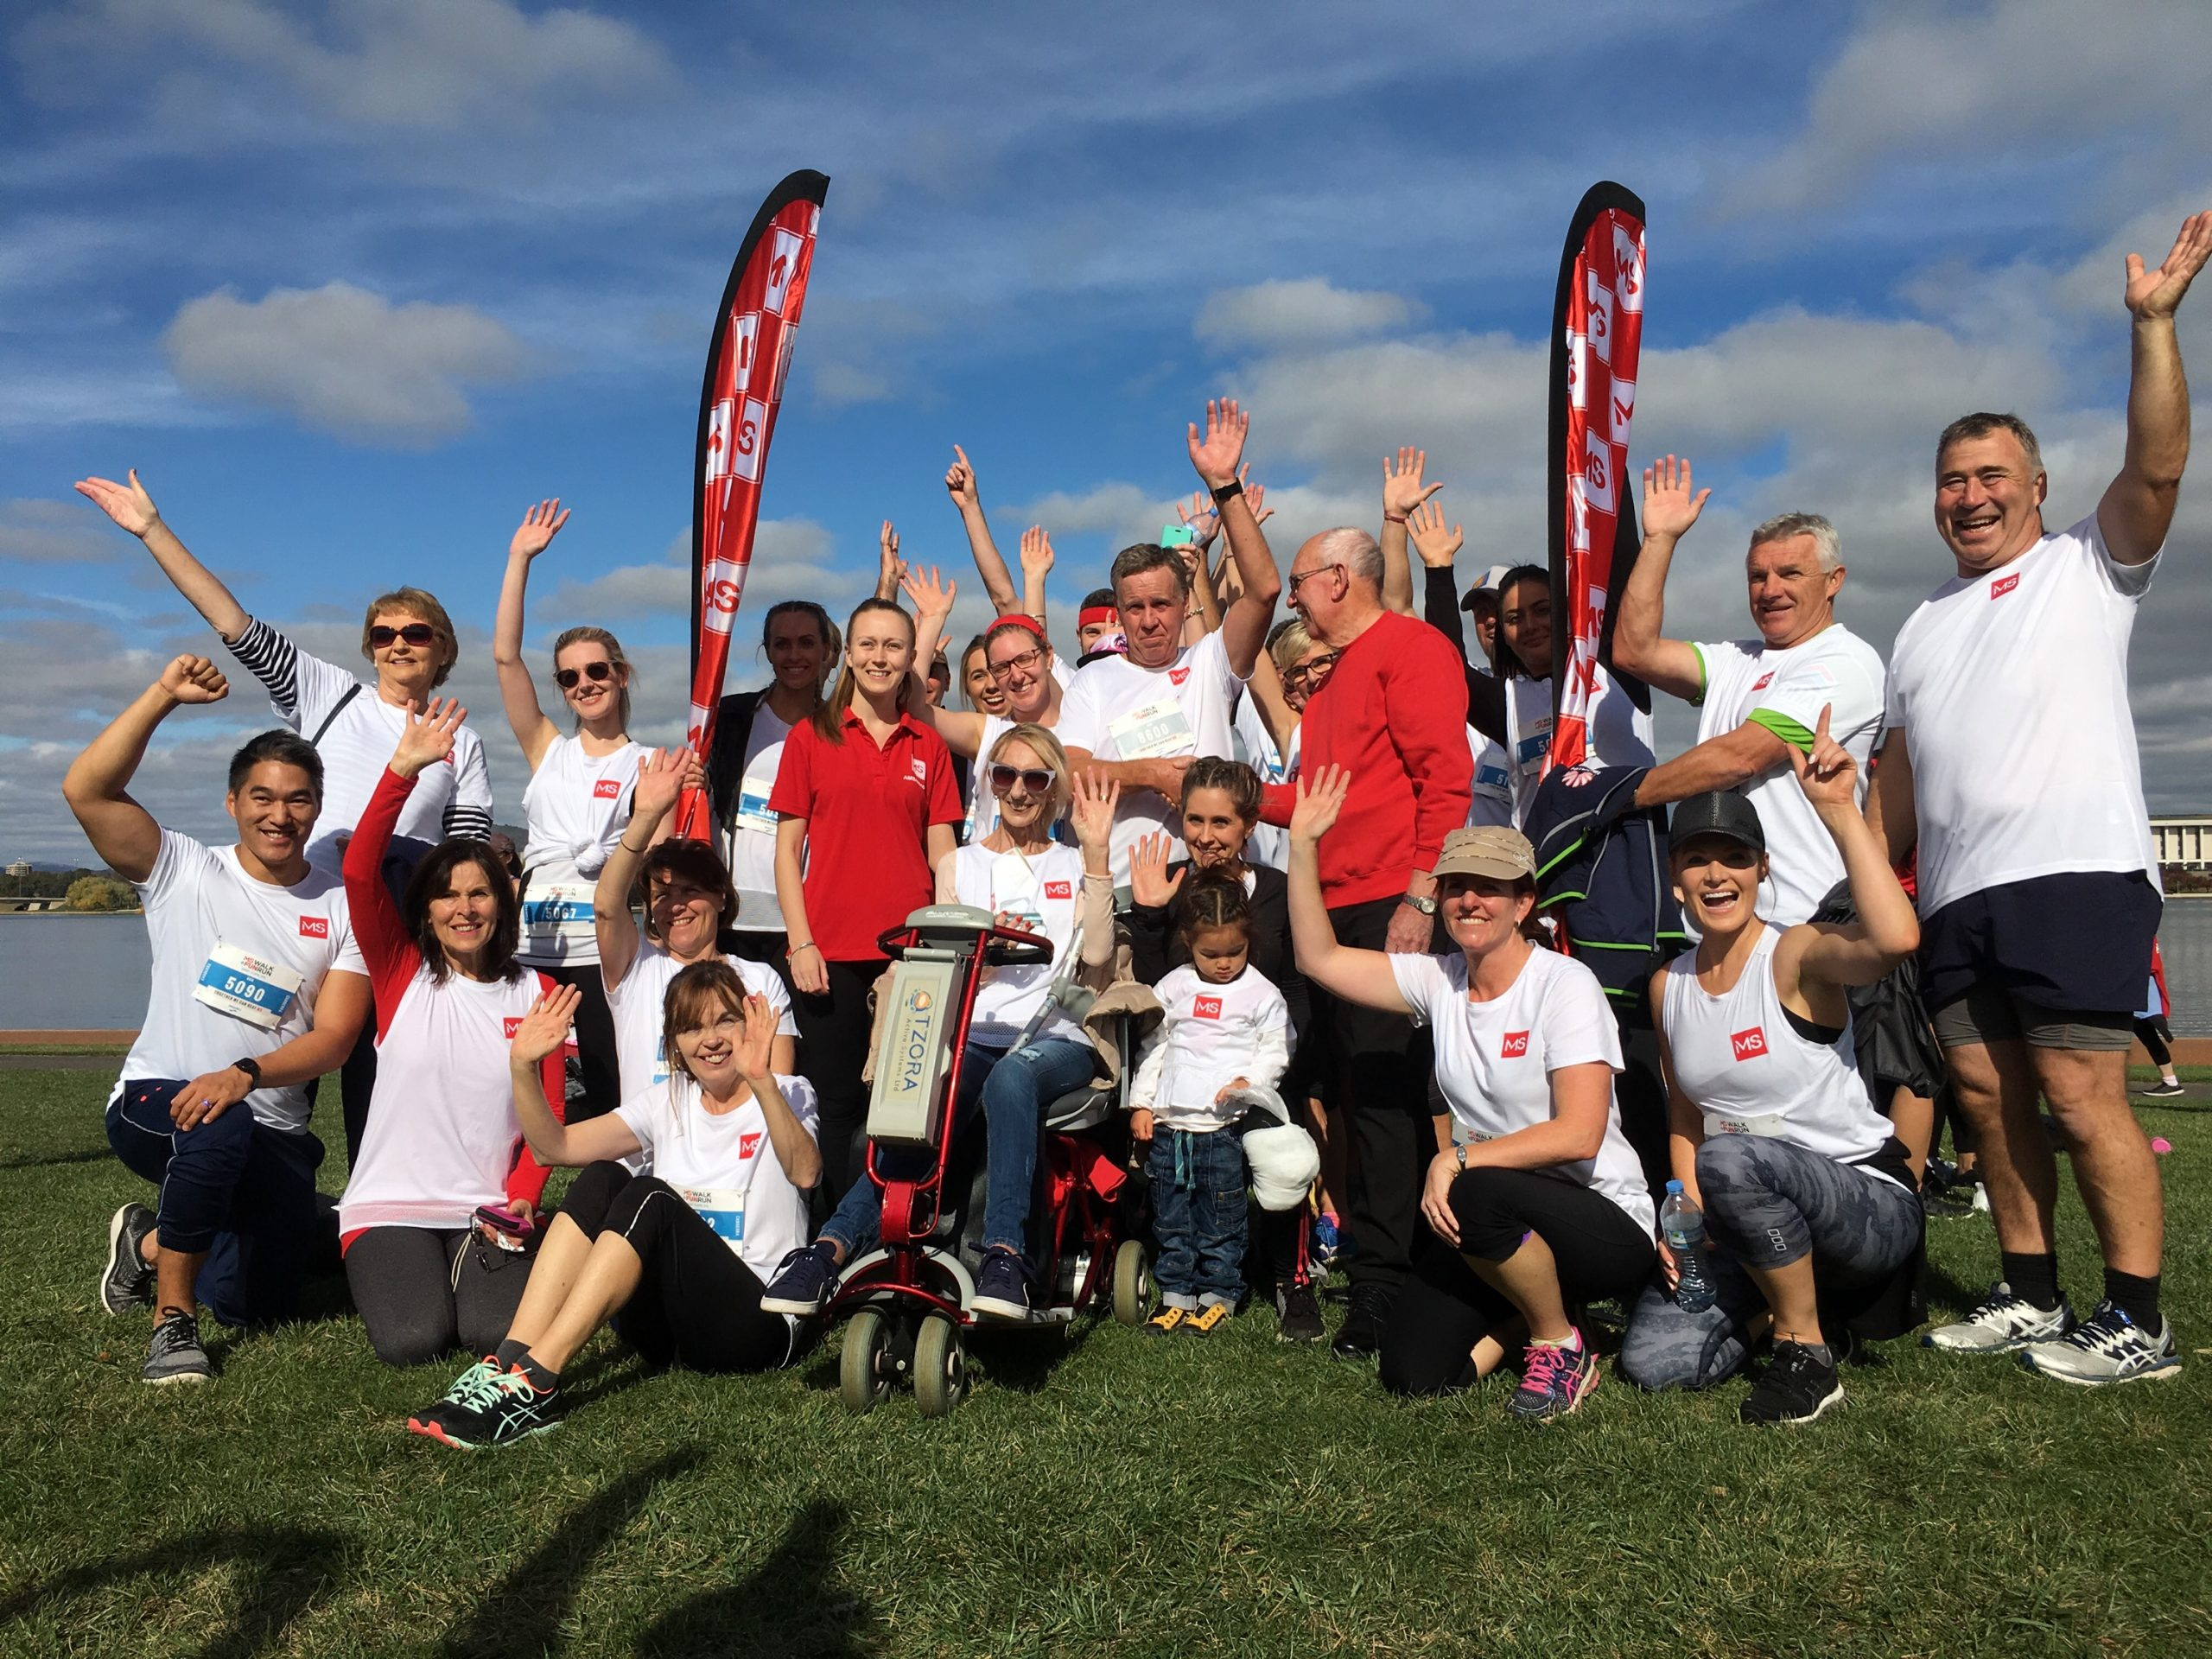 MS Fun Run – Canberra 2018